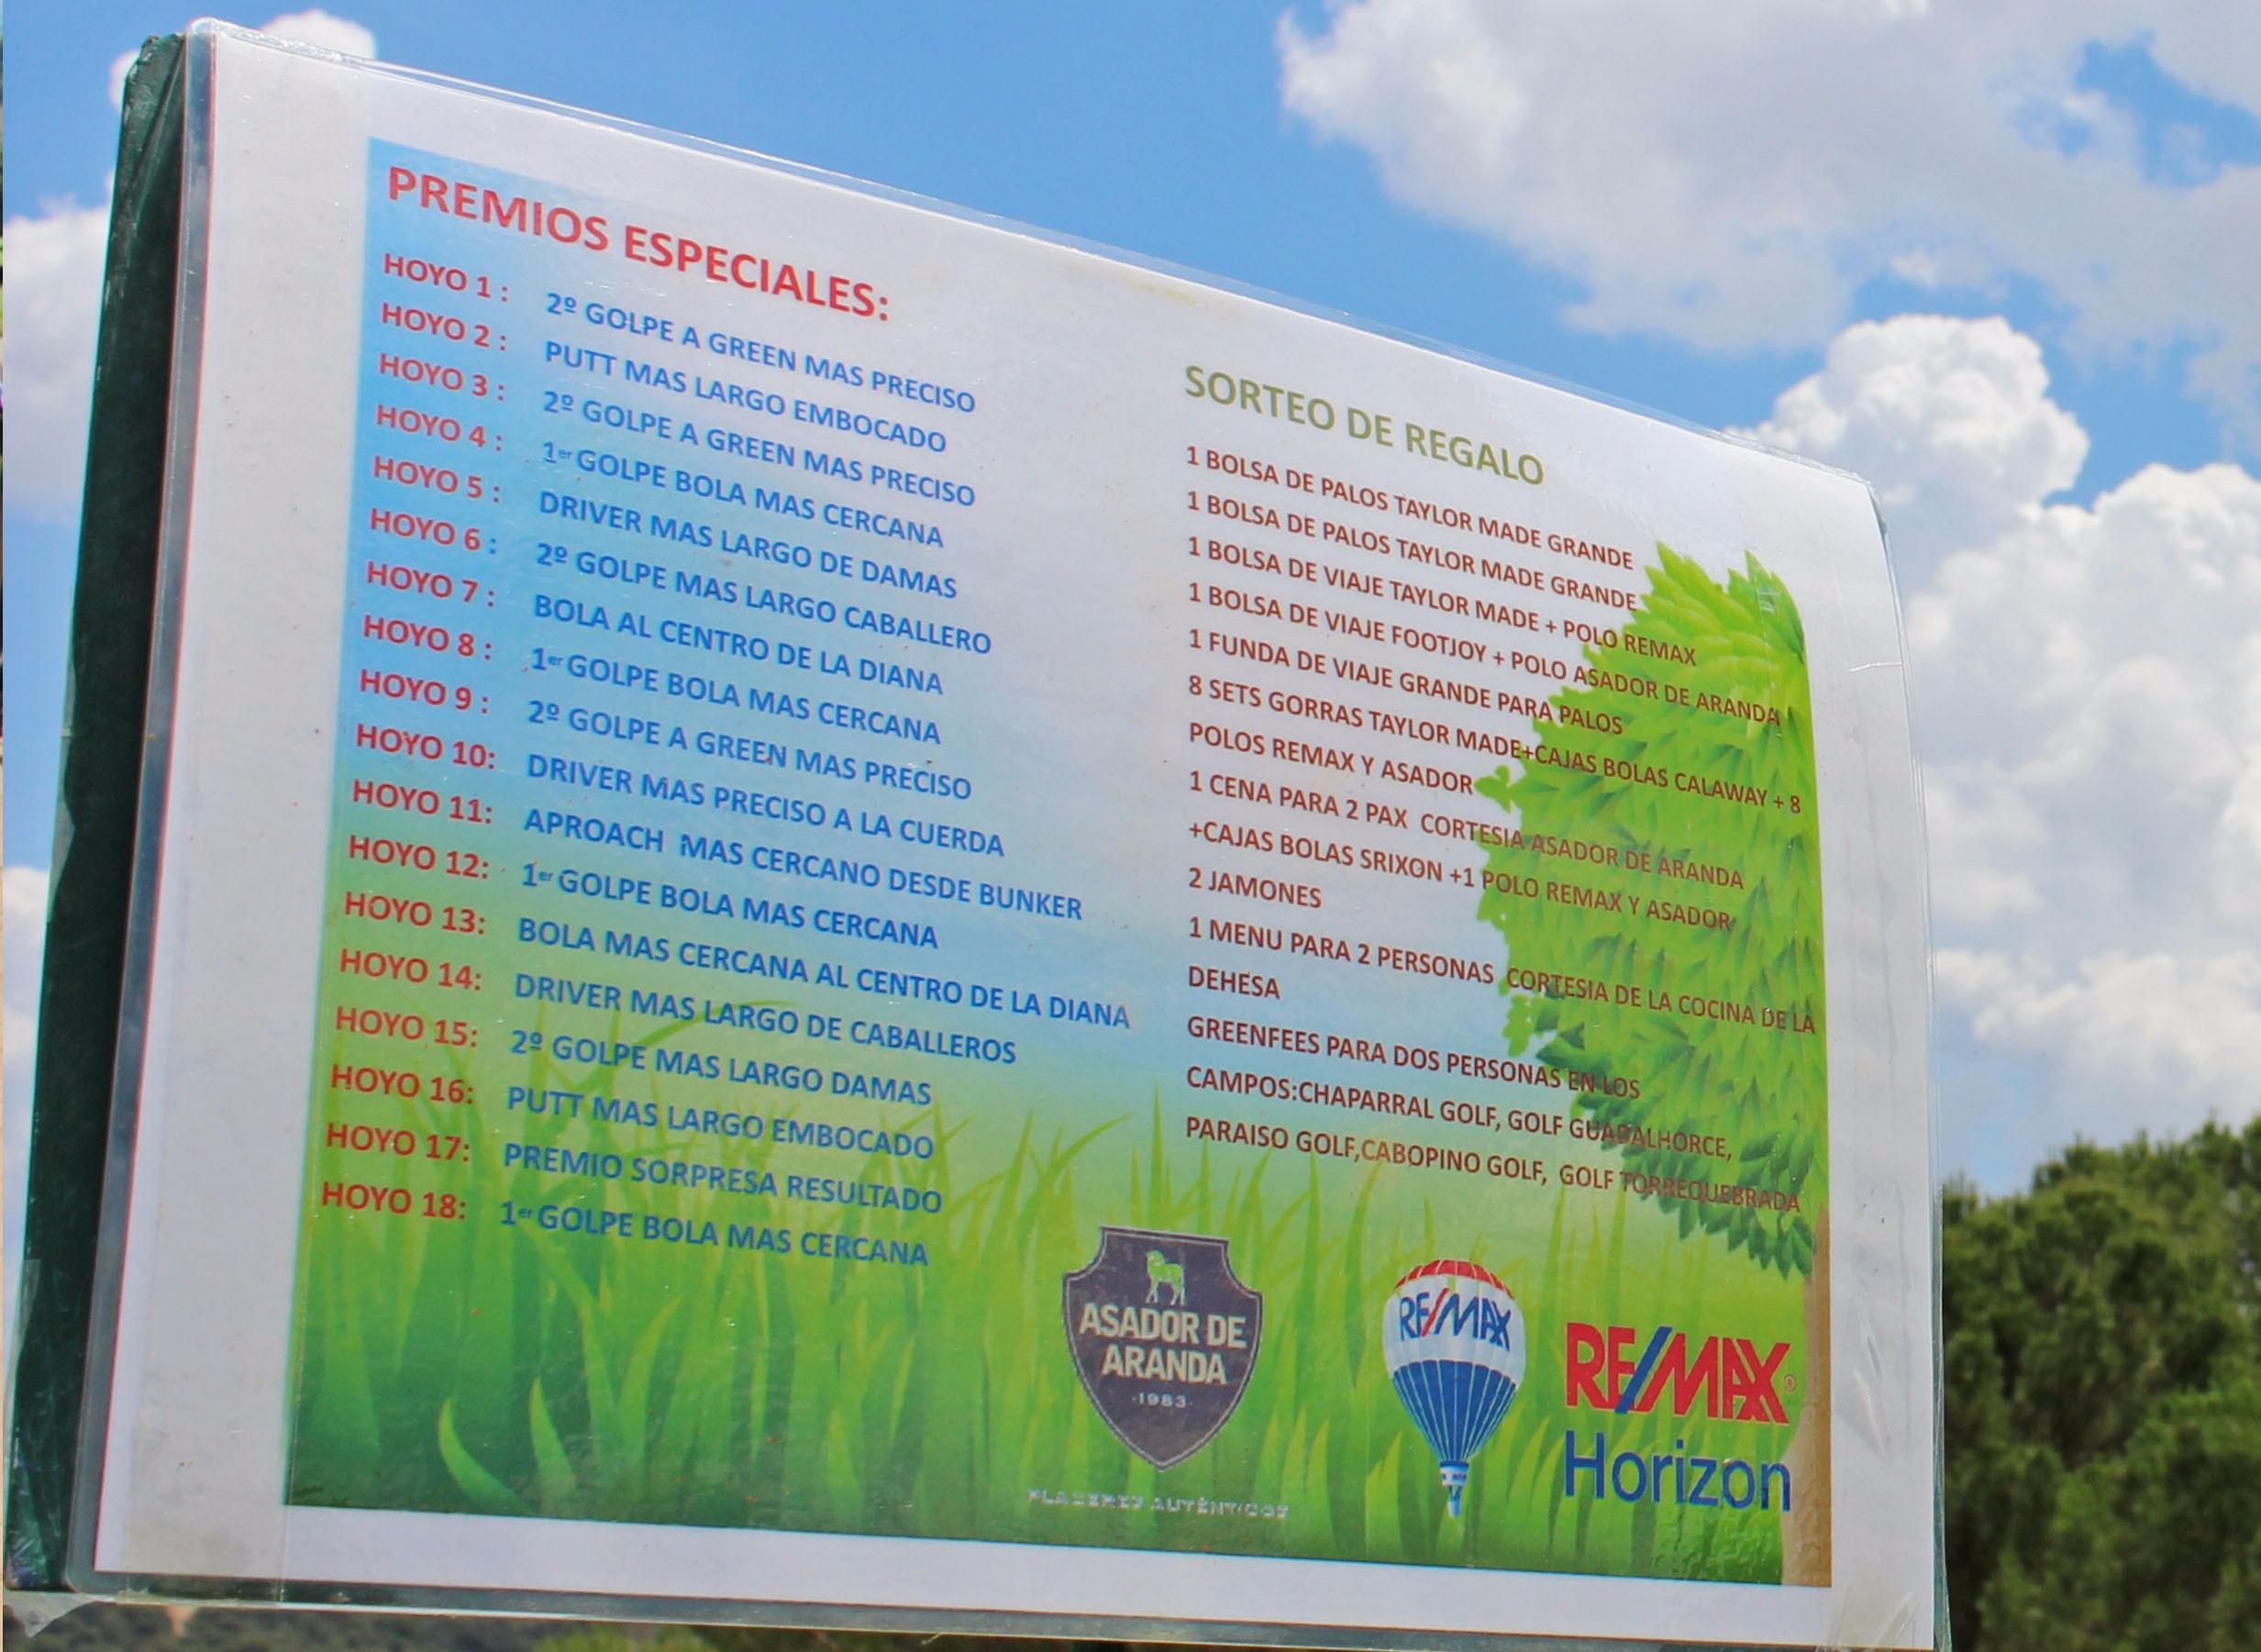 premios golf remax horizon la dehesa villanueva cañada